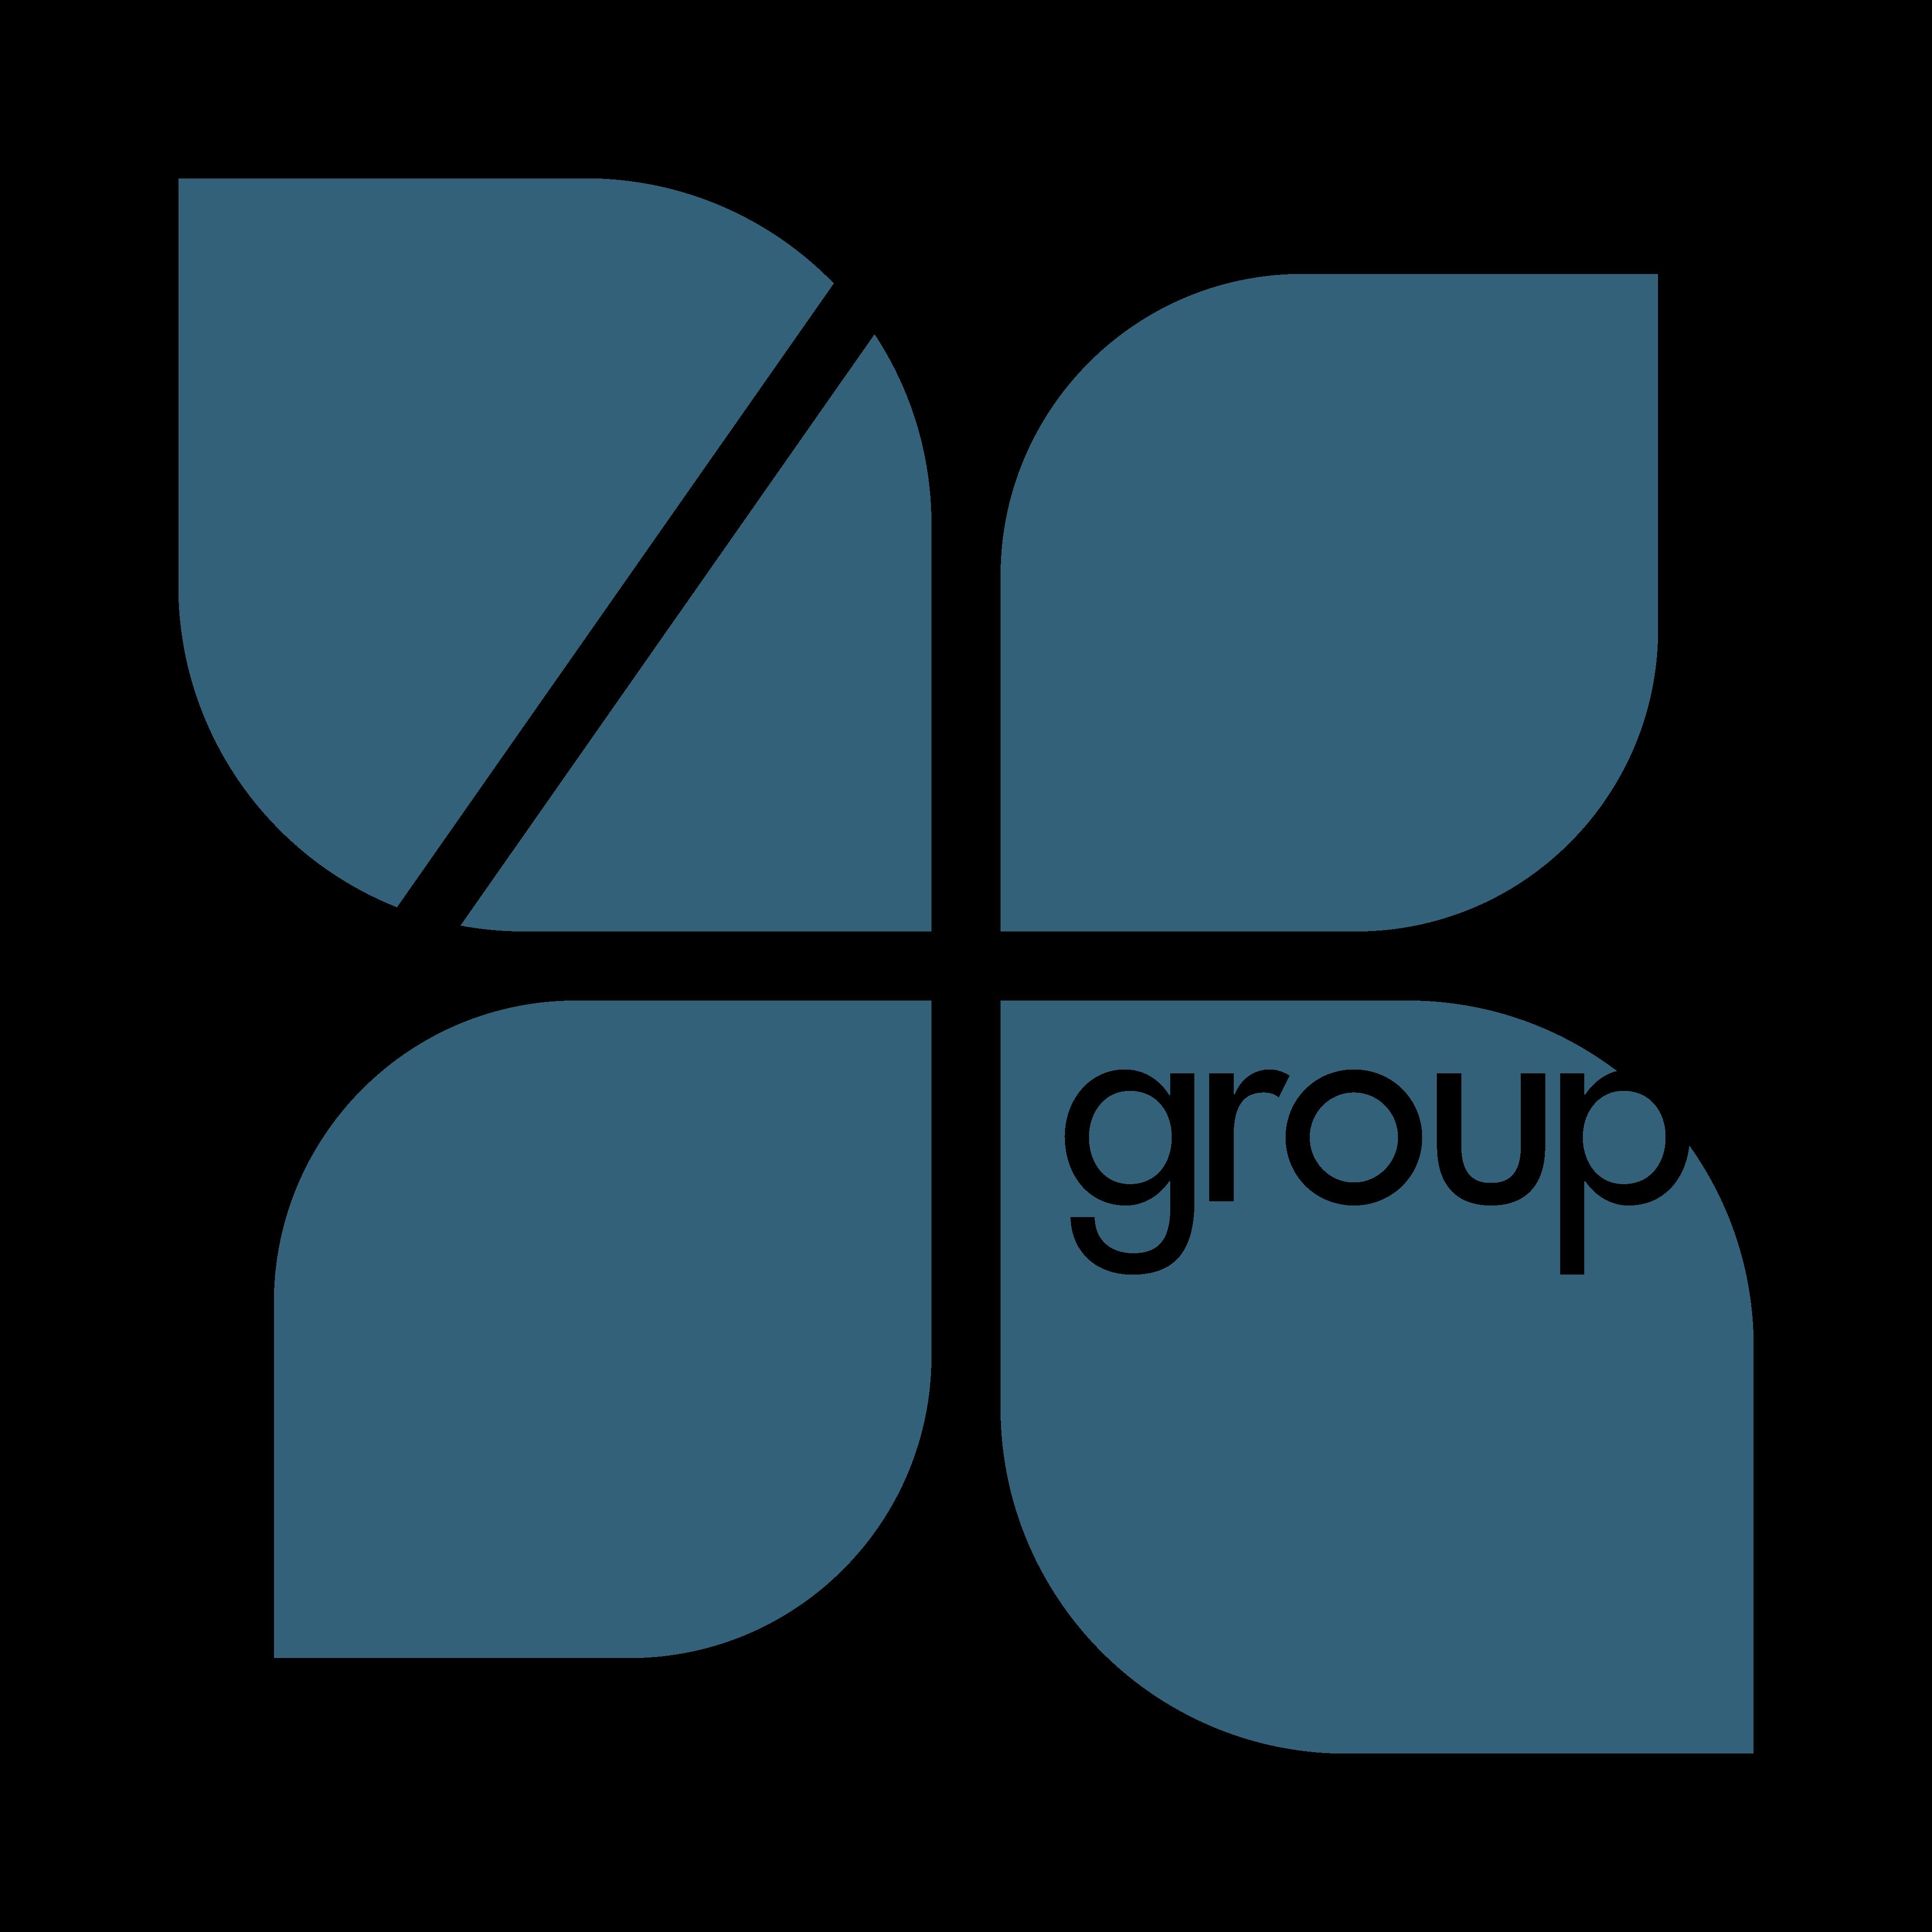 4Group (Organization)